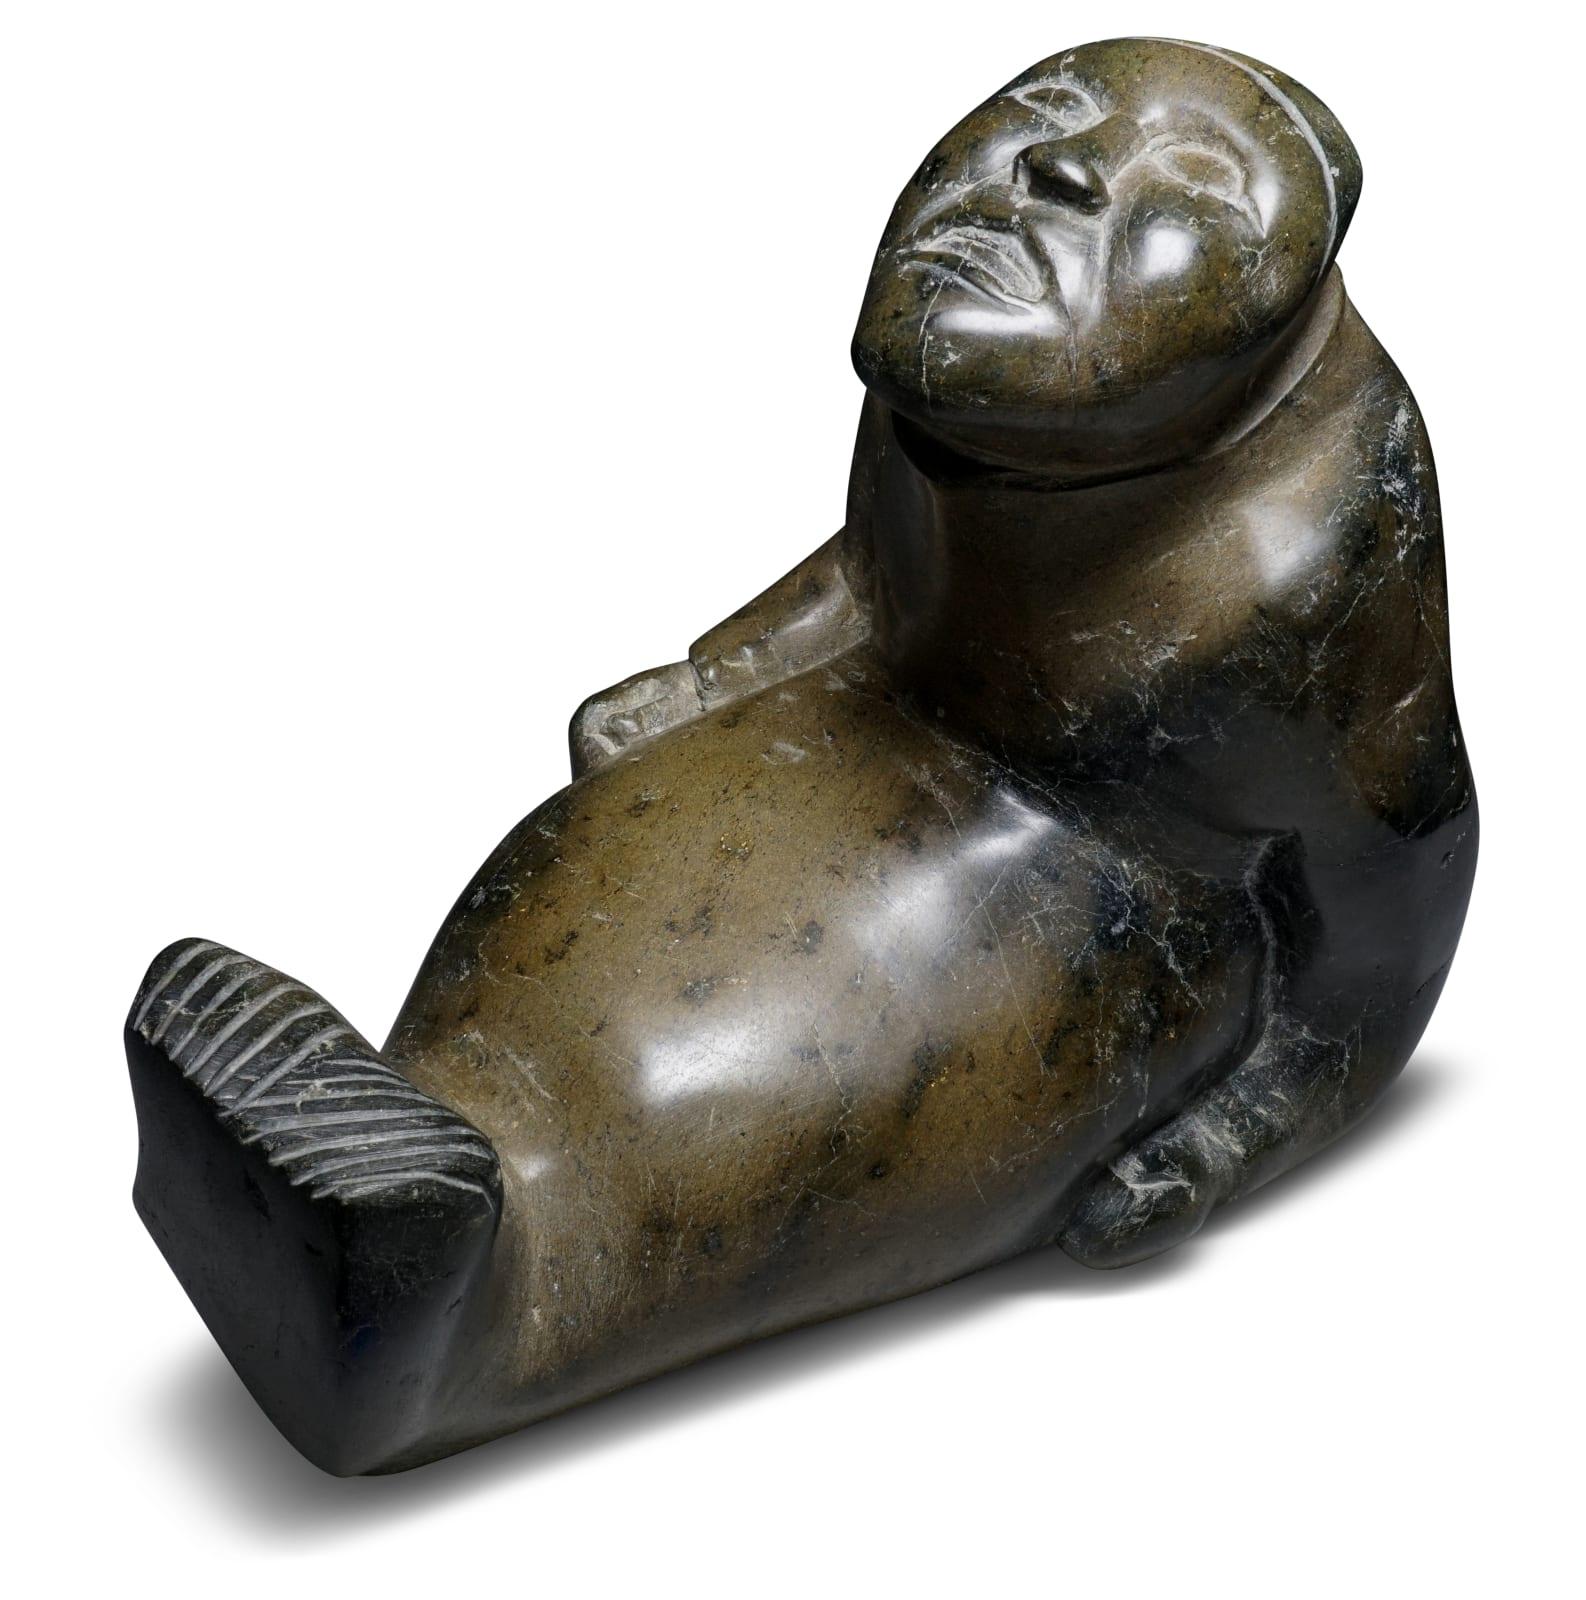 Possibly: TAYARAQ TUNNILLIE (1934-2015) KINNGAIT (CAPE DORSET) Shaman Seal Transformation stone, 12 3/4 x 9 x 14 in (32.4 x 22.9 x 35.6 cm) ESTIMATE: $2,000 — $3,000 New Price: $1,600